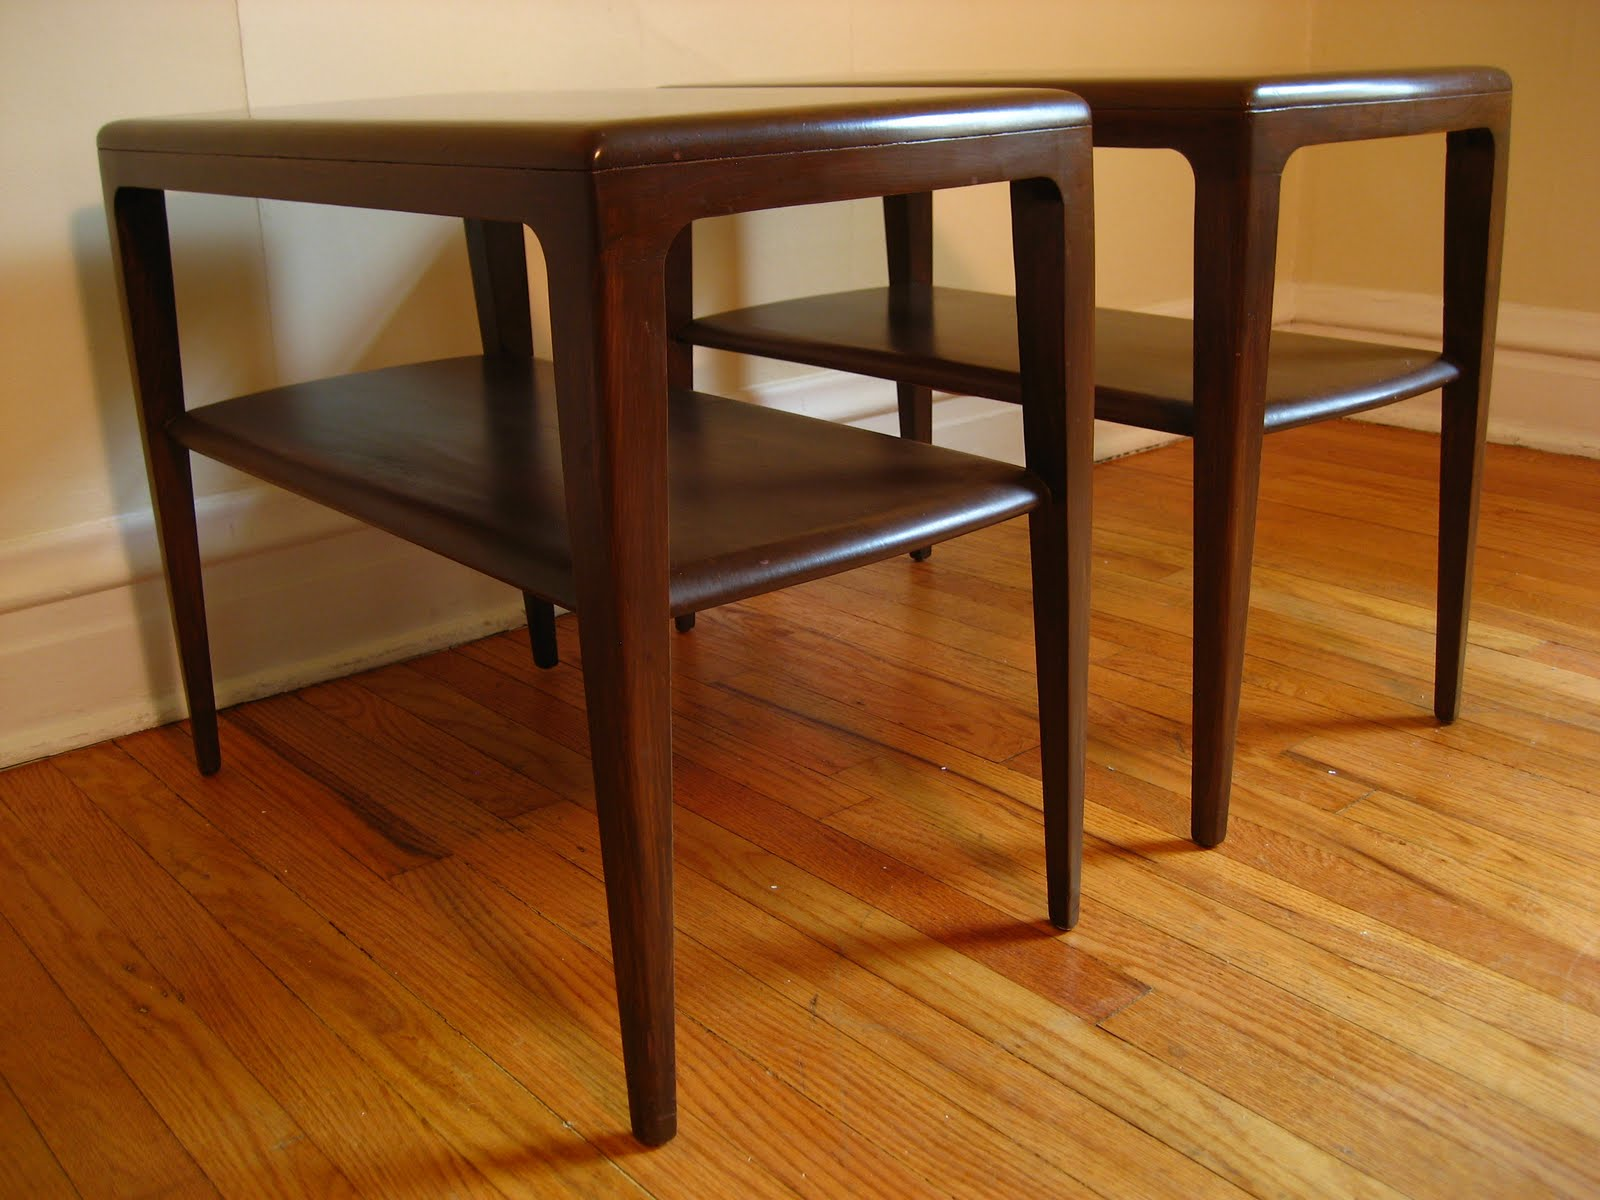 Flatout Design Heywood Wakefield End Tables